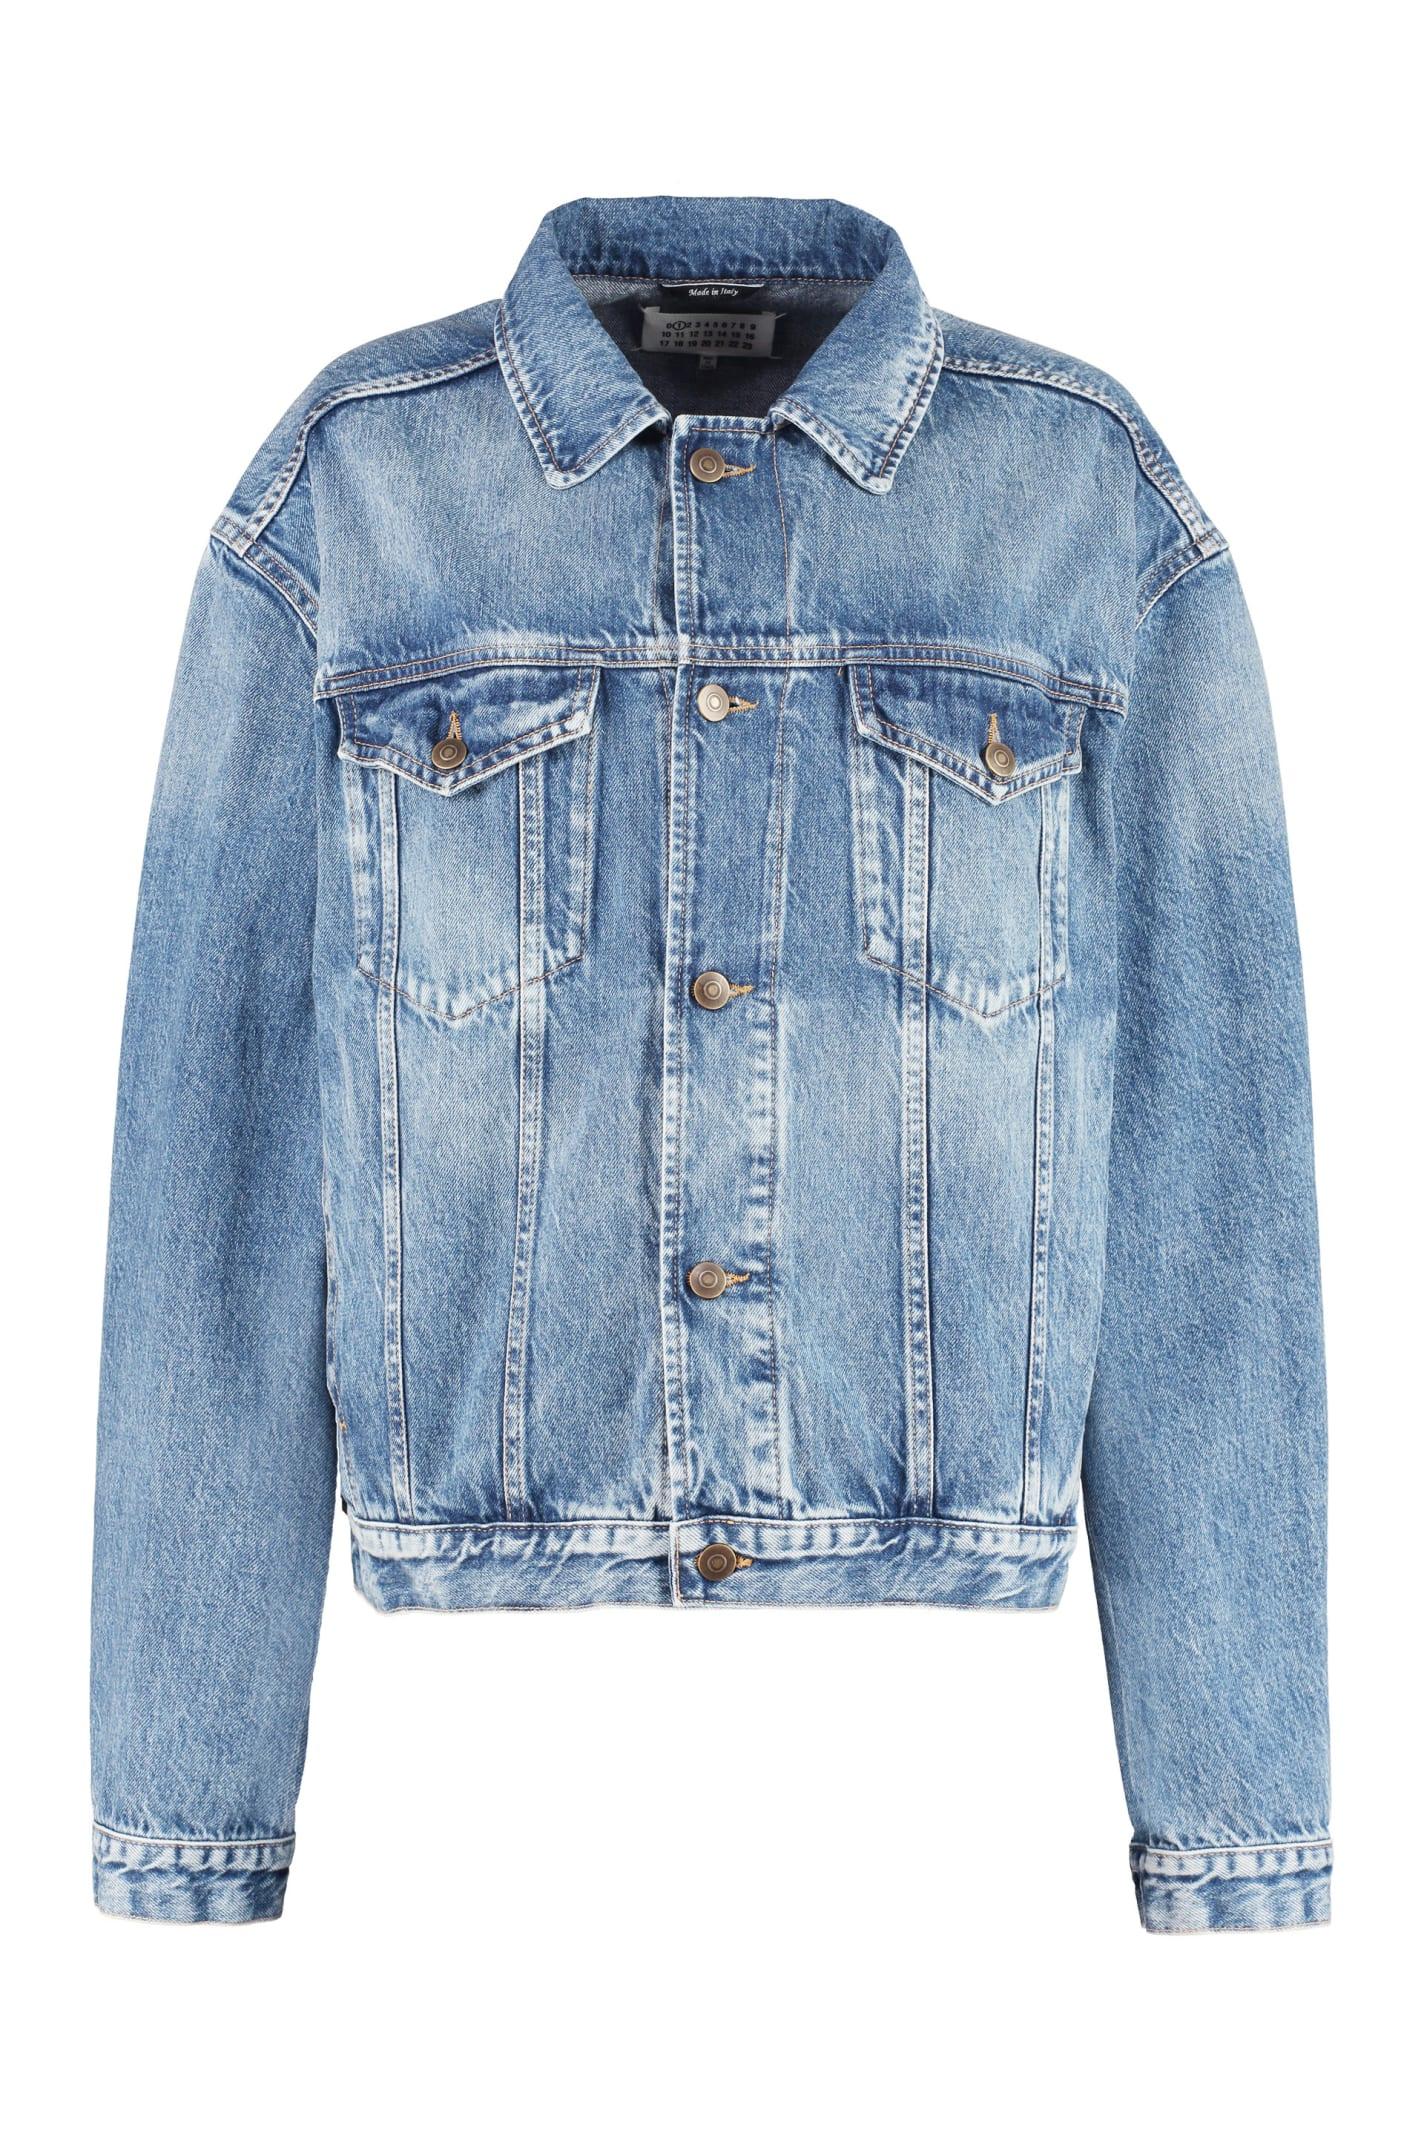 Maison Margiela Bleach Wash Denim Jacket